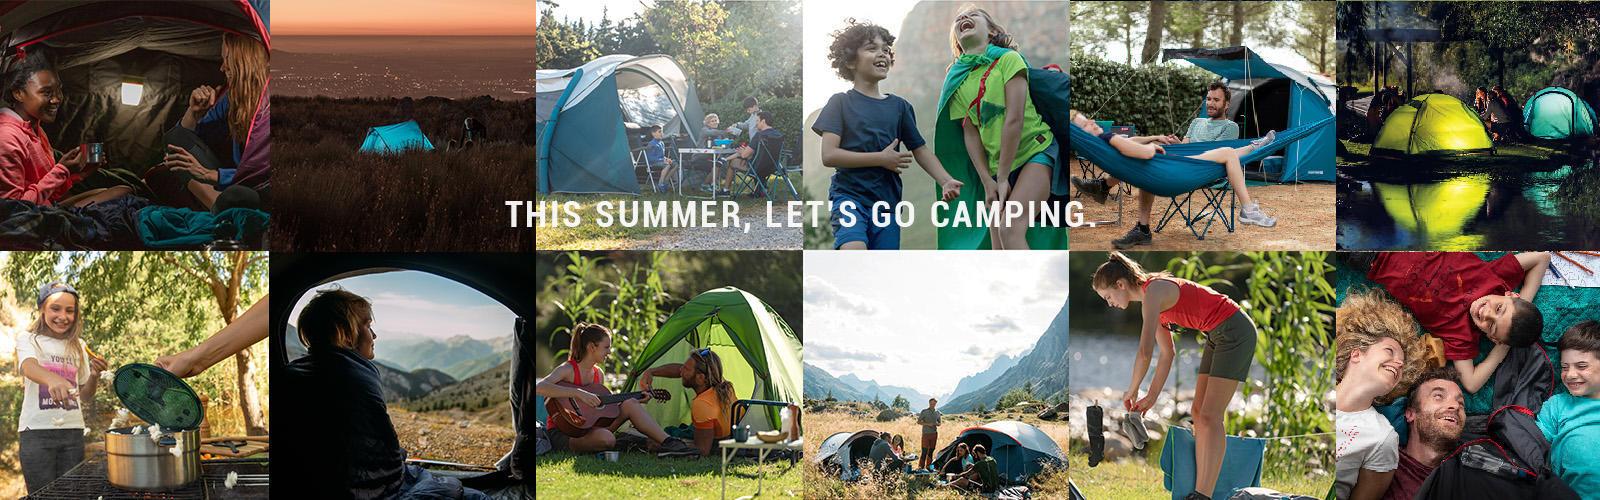 this summer let's go camping mountain hiking quechua decathlon